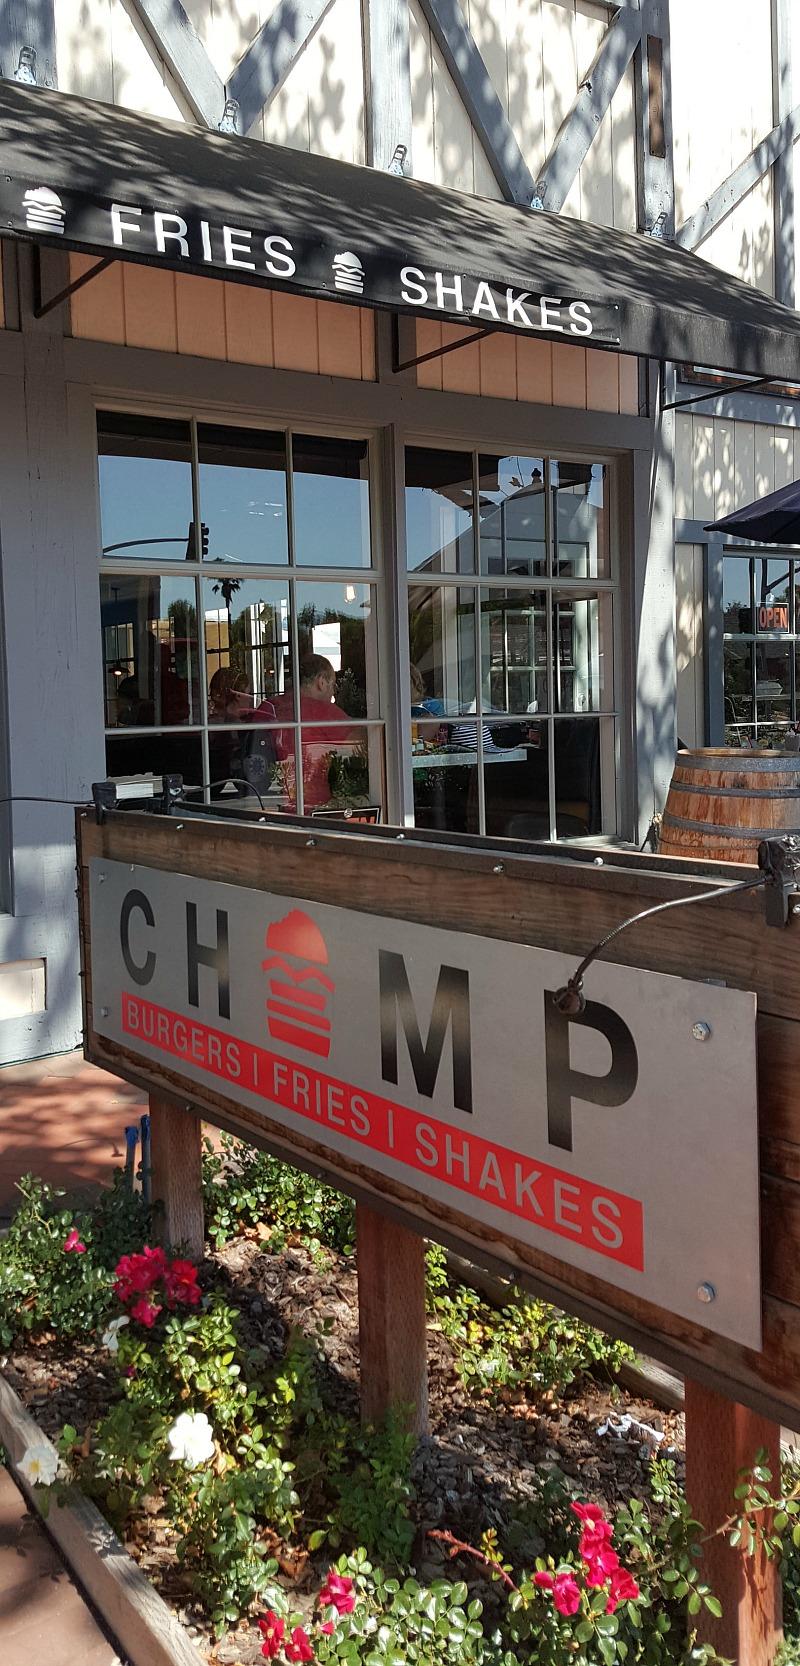 Chomp - A Modern American Diner in Solvang